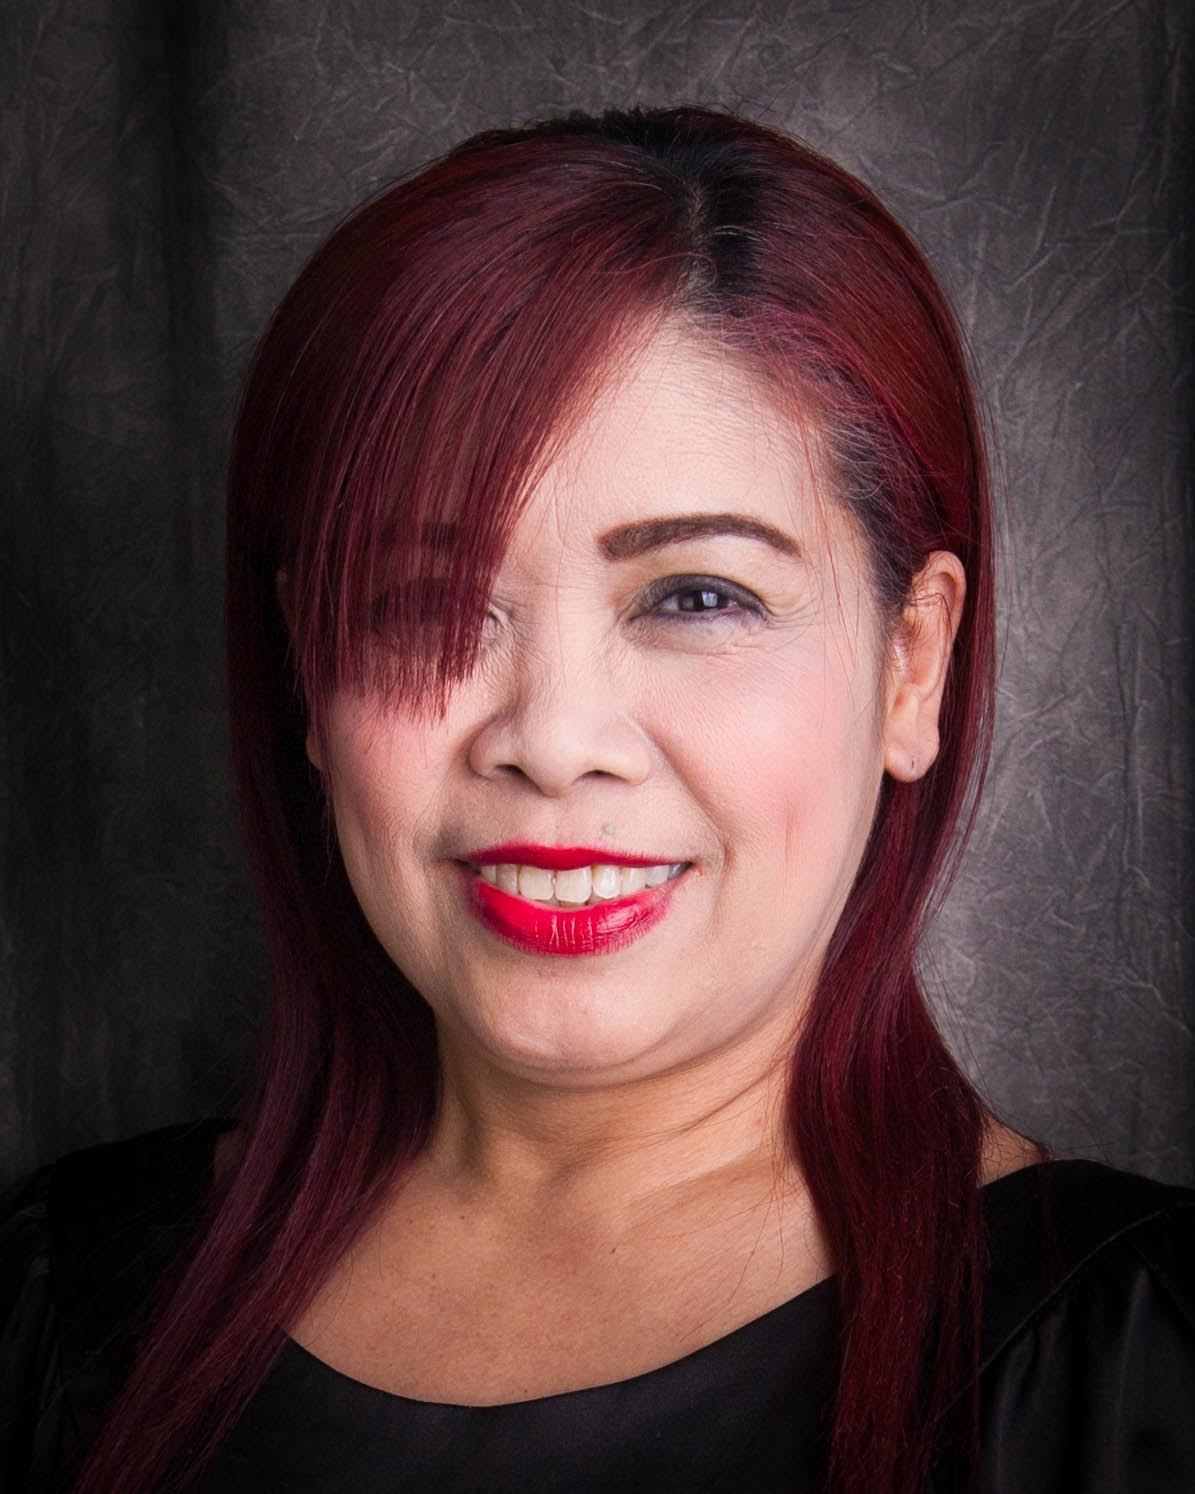 Jossette Santos